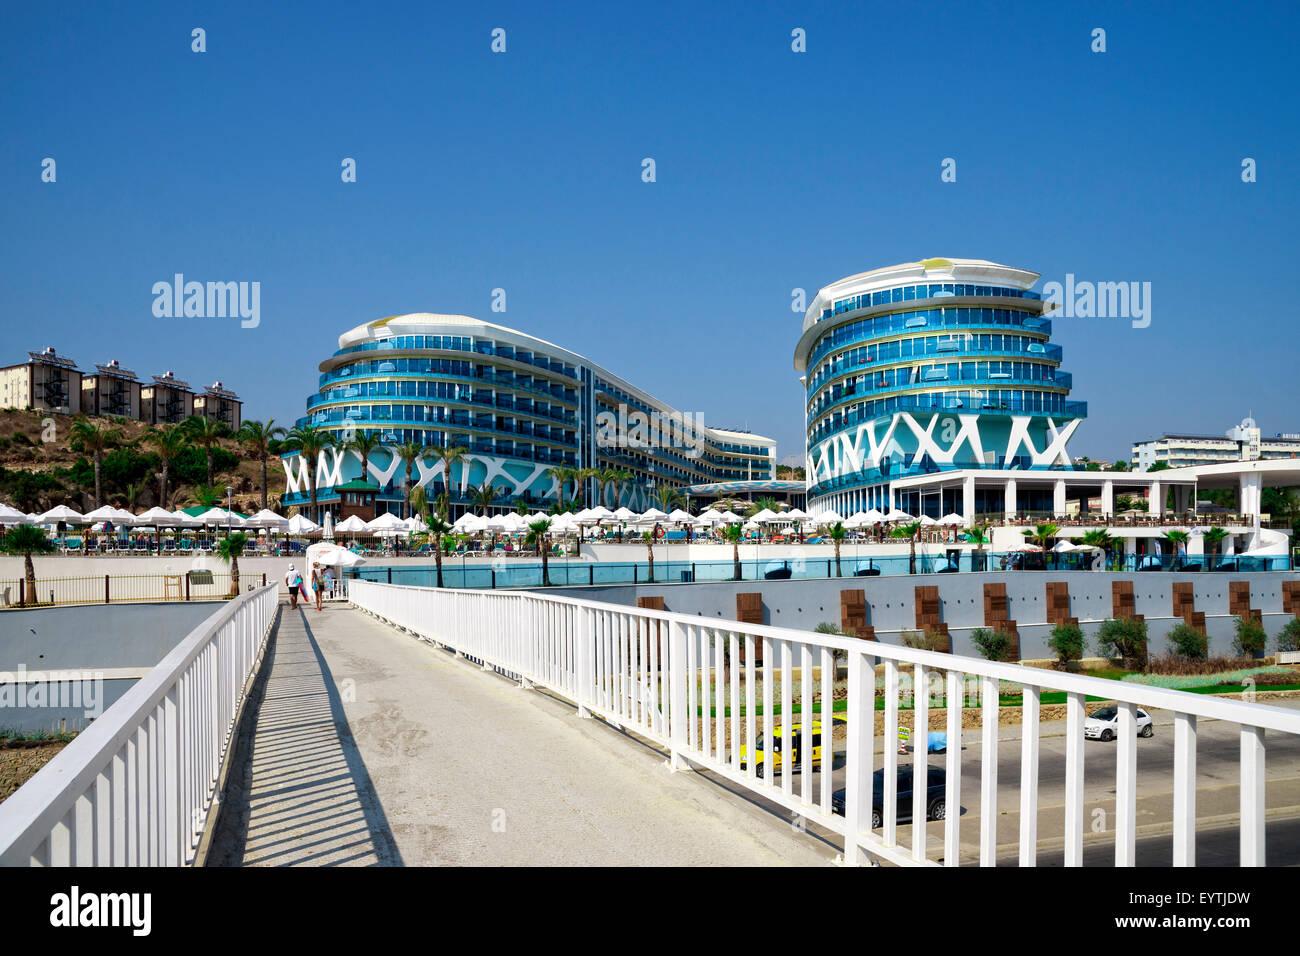 Resort Hotel Turkey Stock Photos & Resort Hotel Turkey Stock Images ...